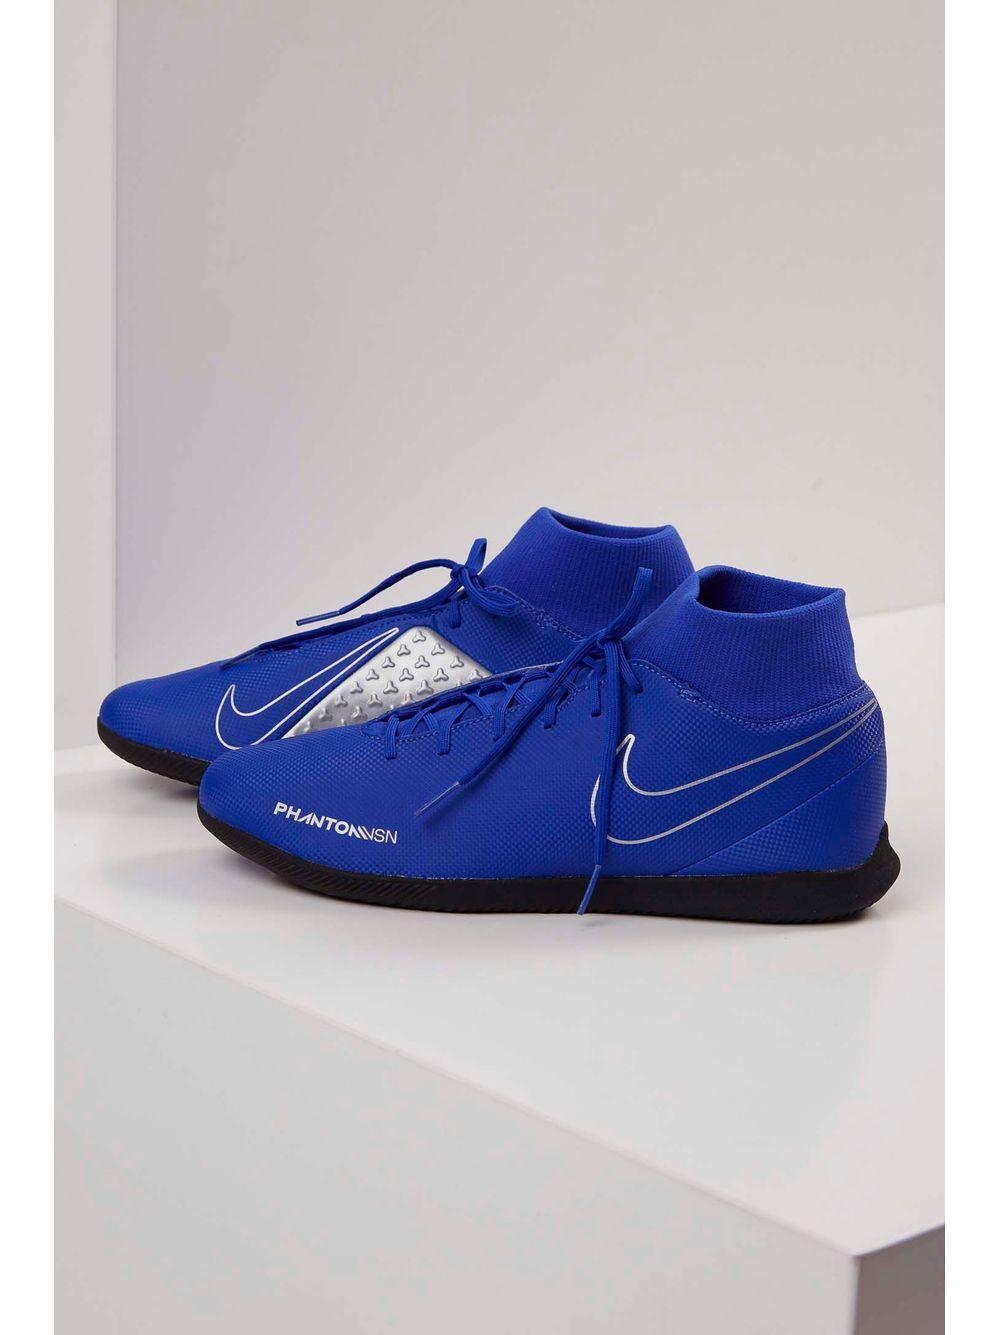 Chuteira Nike Phantom Vision Club Azul - pittol 464c6c66aa6f0